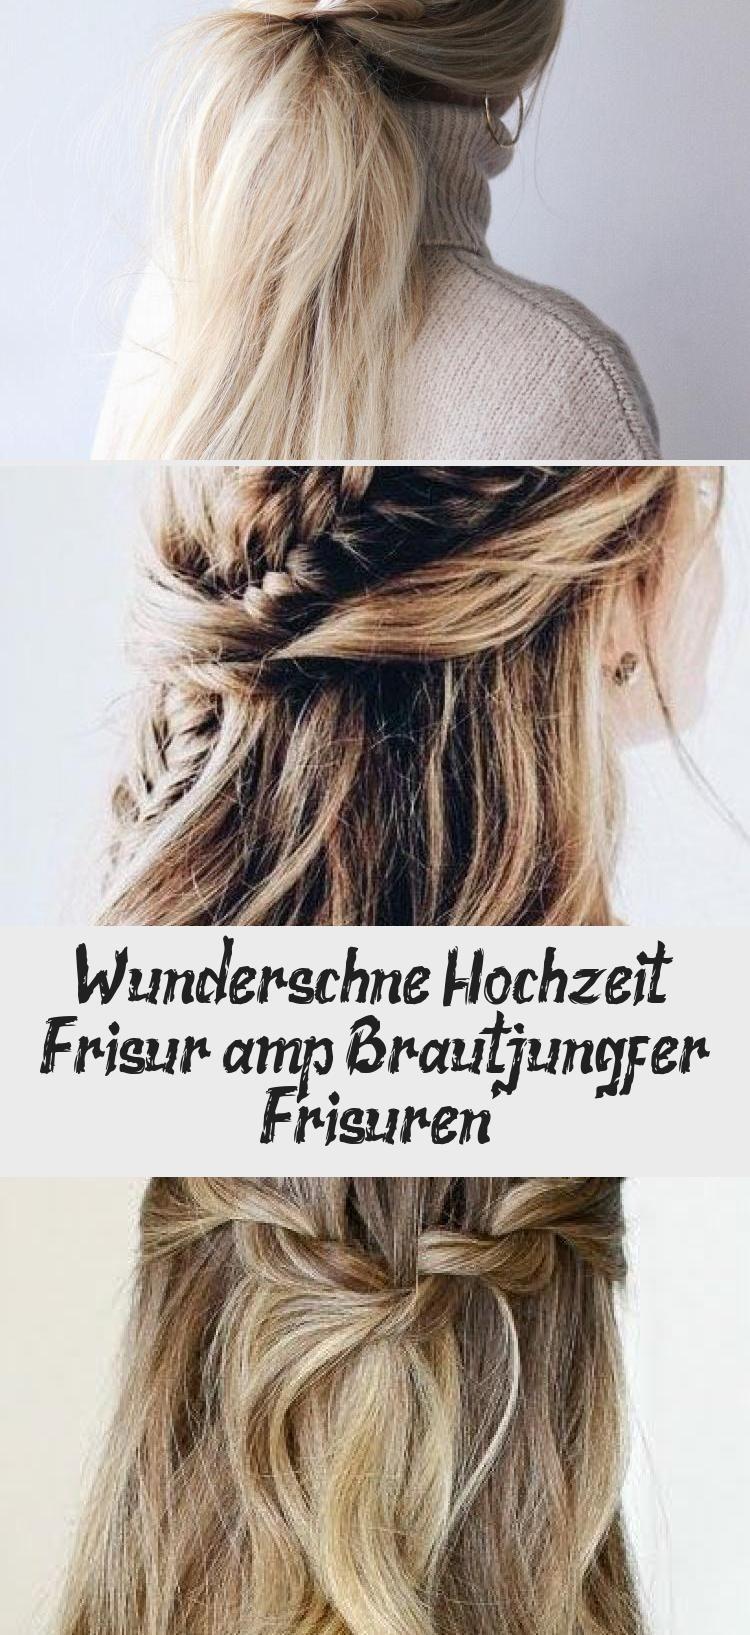 Wunderschone Hochzeit Frisur Brautjungfer Frisuren In 2020 Long Hair Styles Hair Styles Beauty